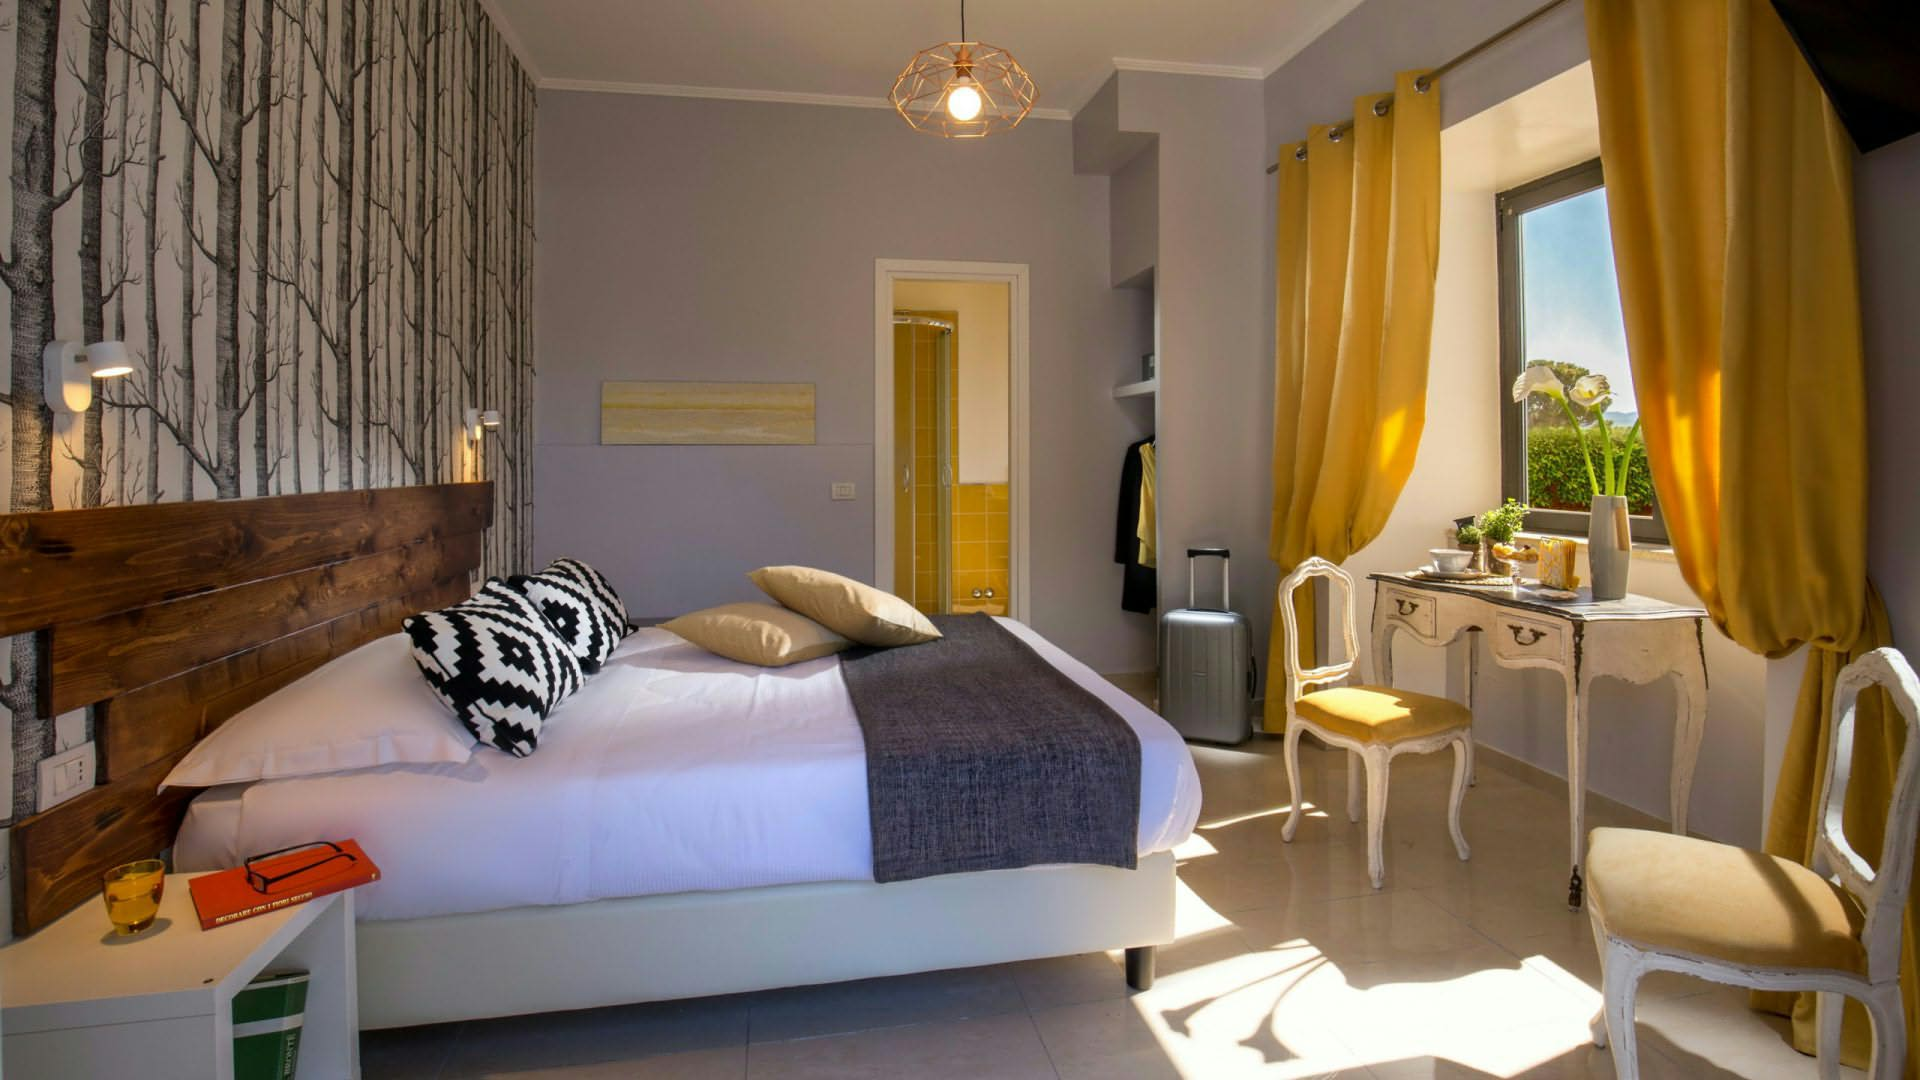 urbangarden-hotel-rome-rooms-02